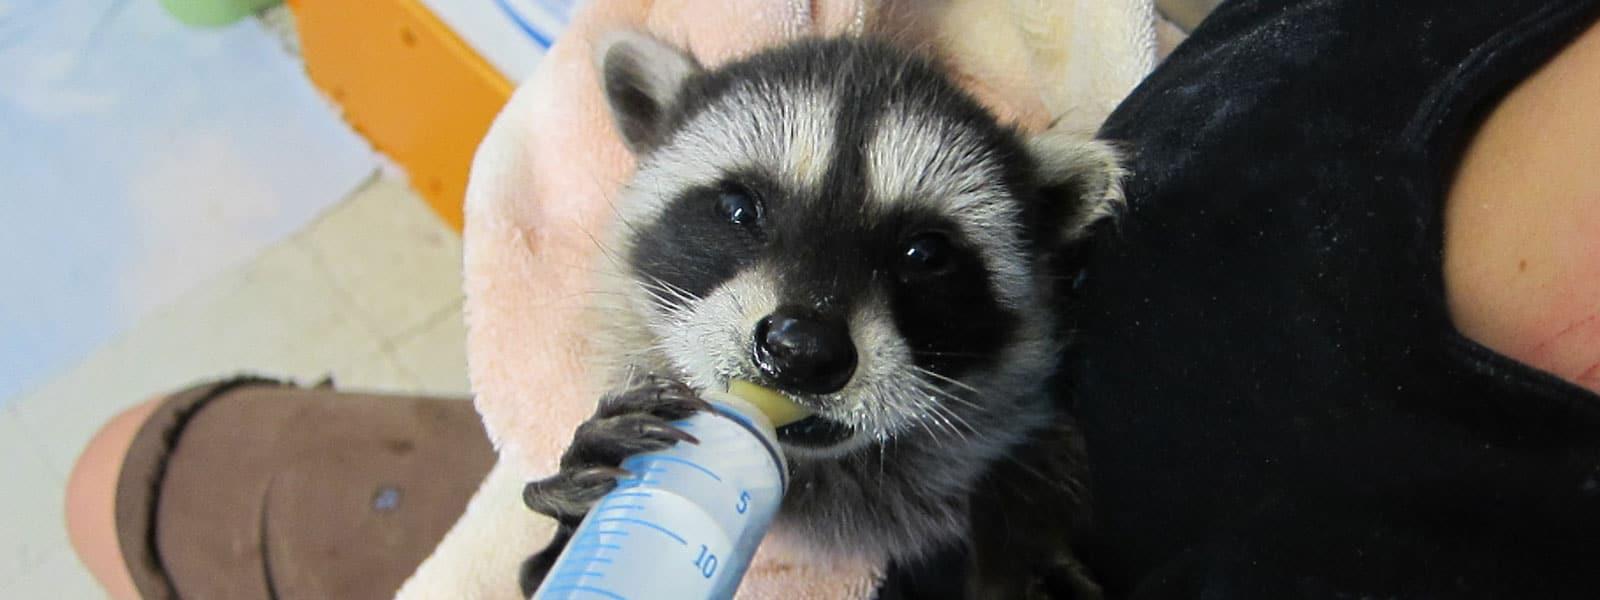 Feeding an orphaned raccoon baby. Photo by Alison Hermance